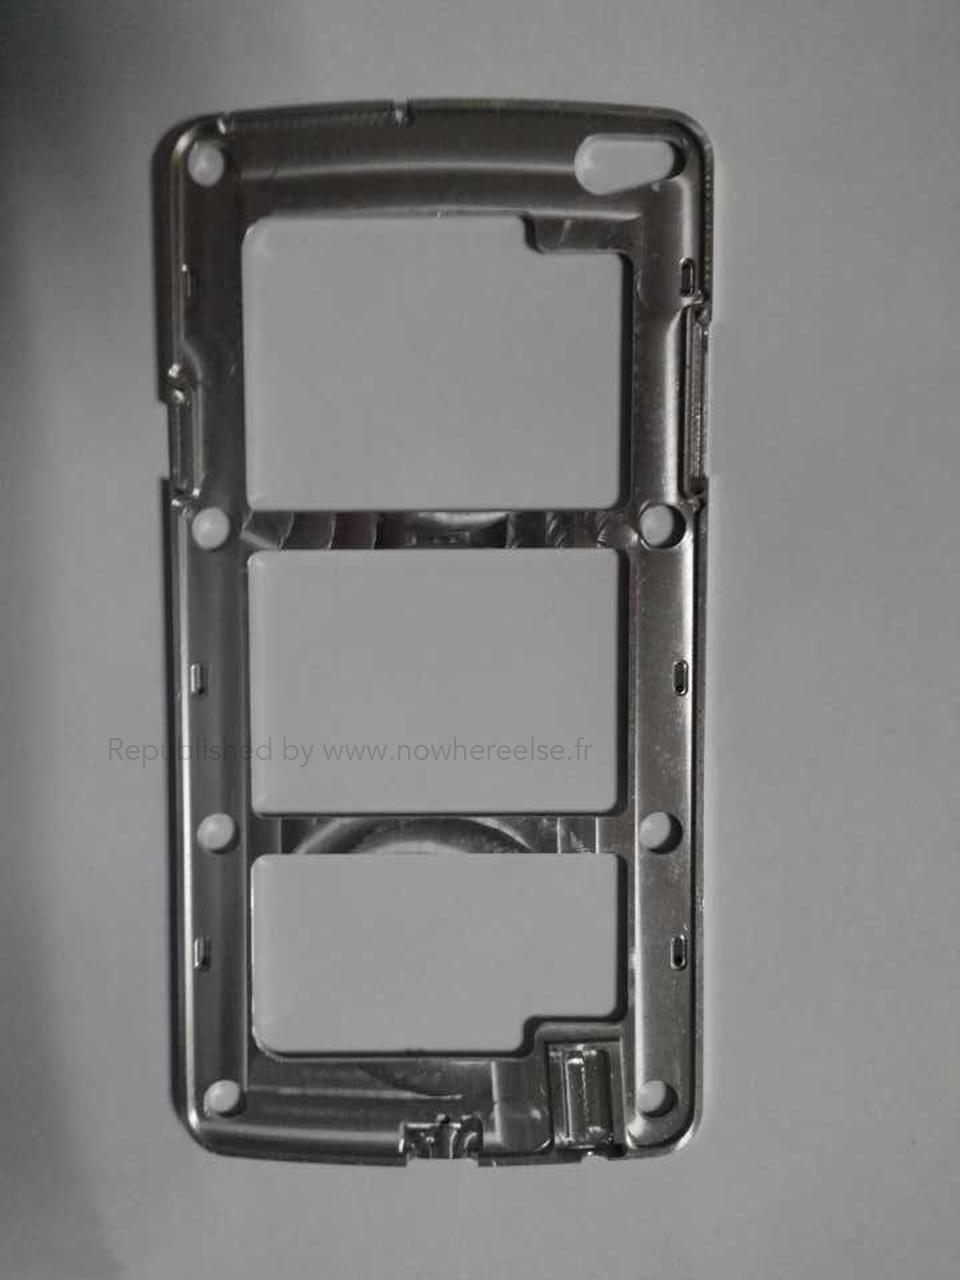 Основа Samsung Galaxy S5 - фото